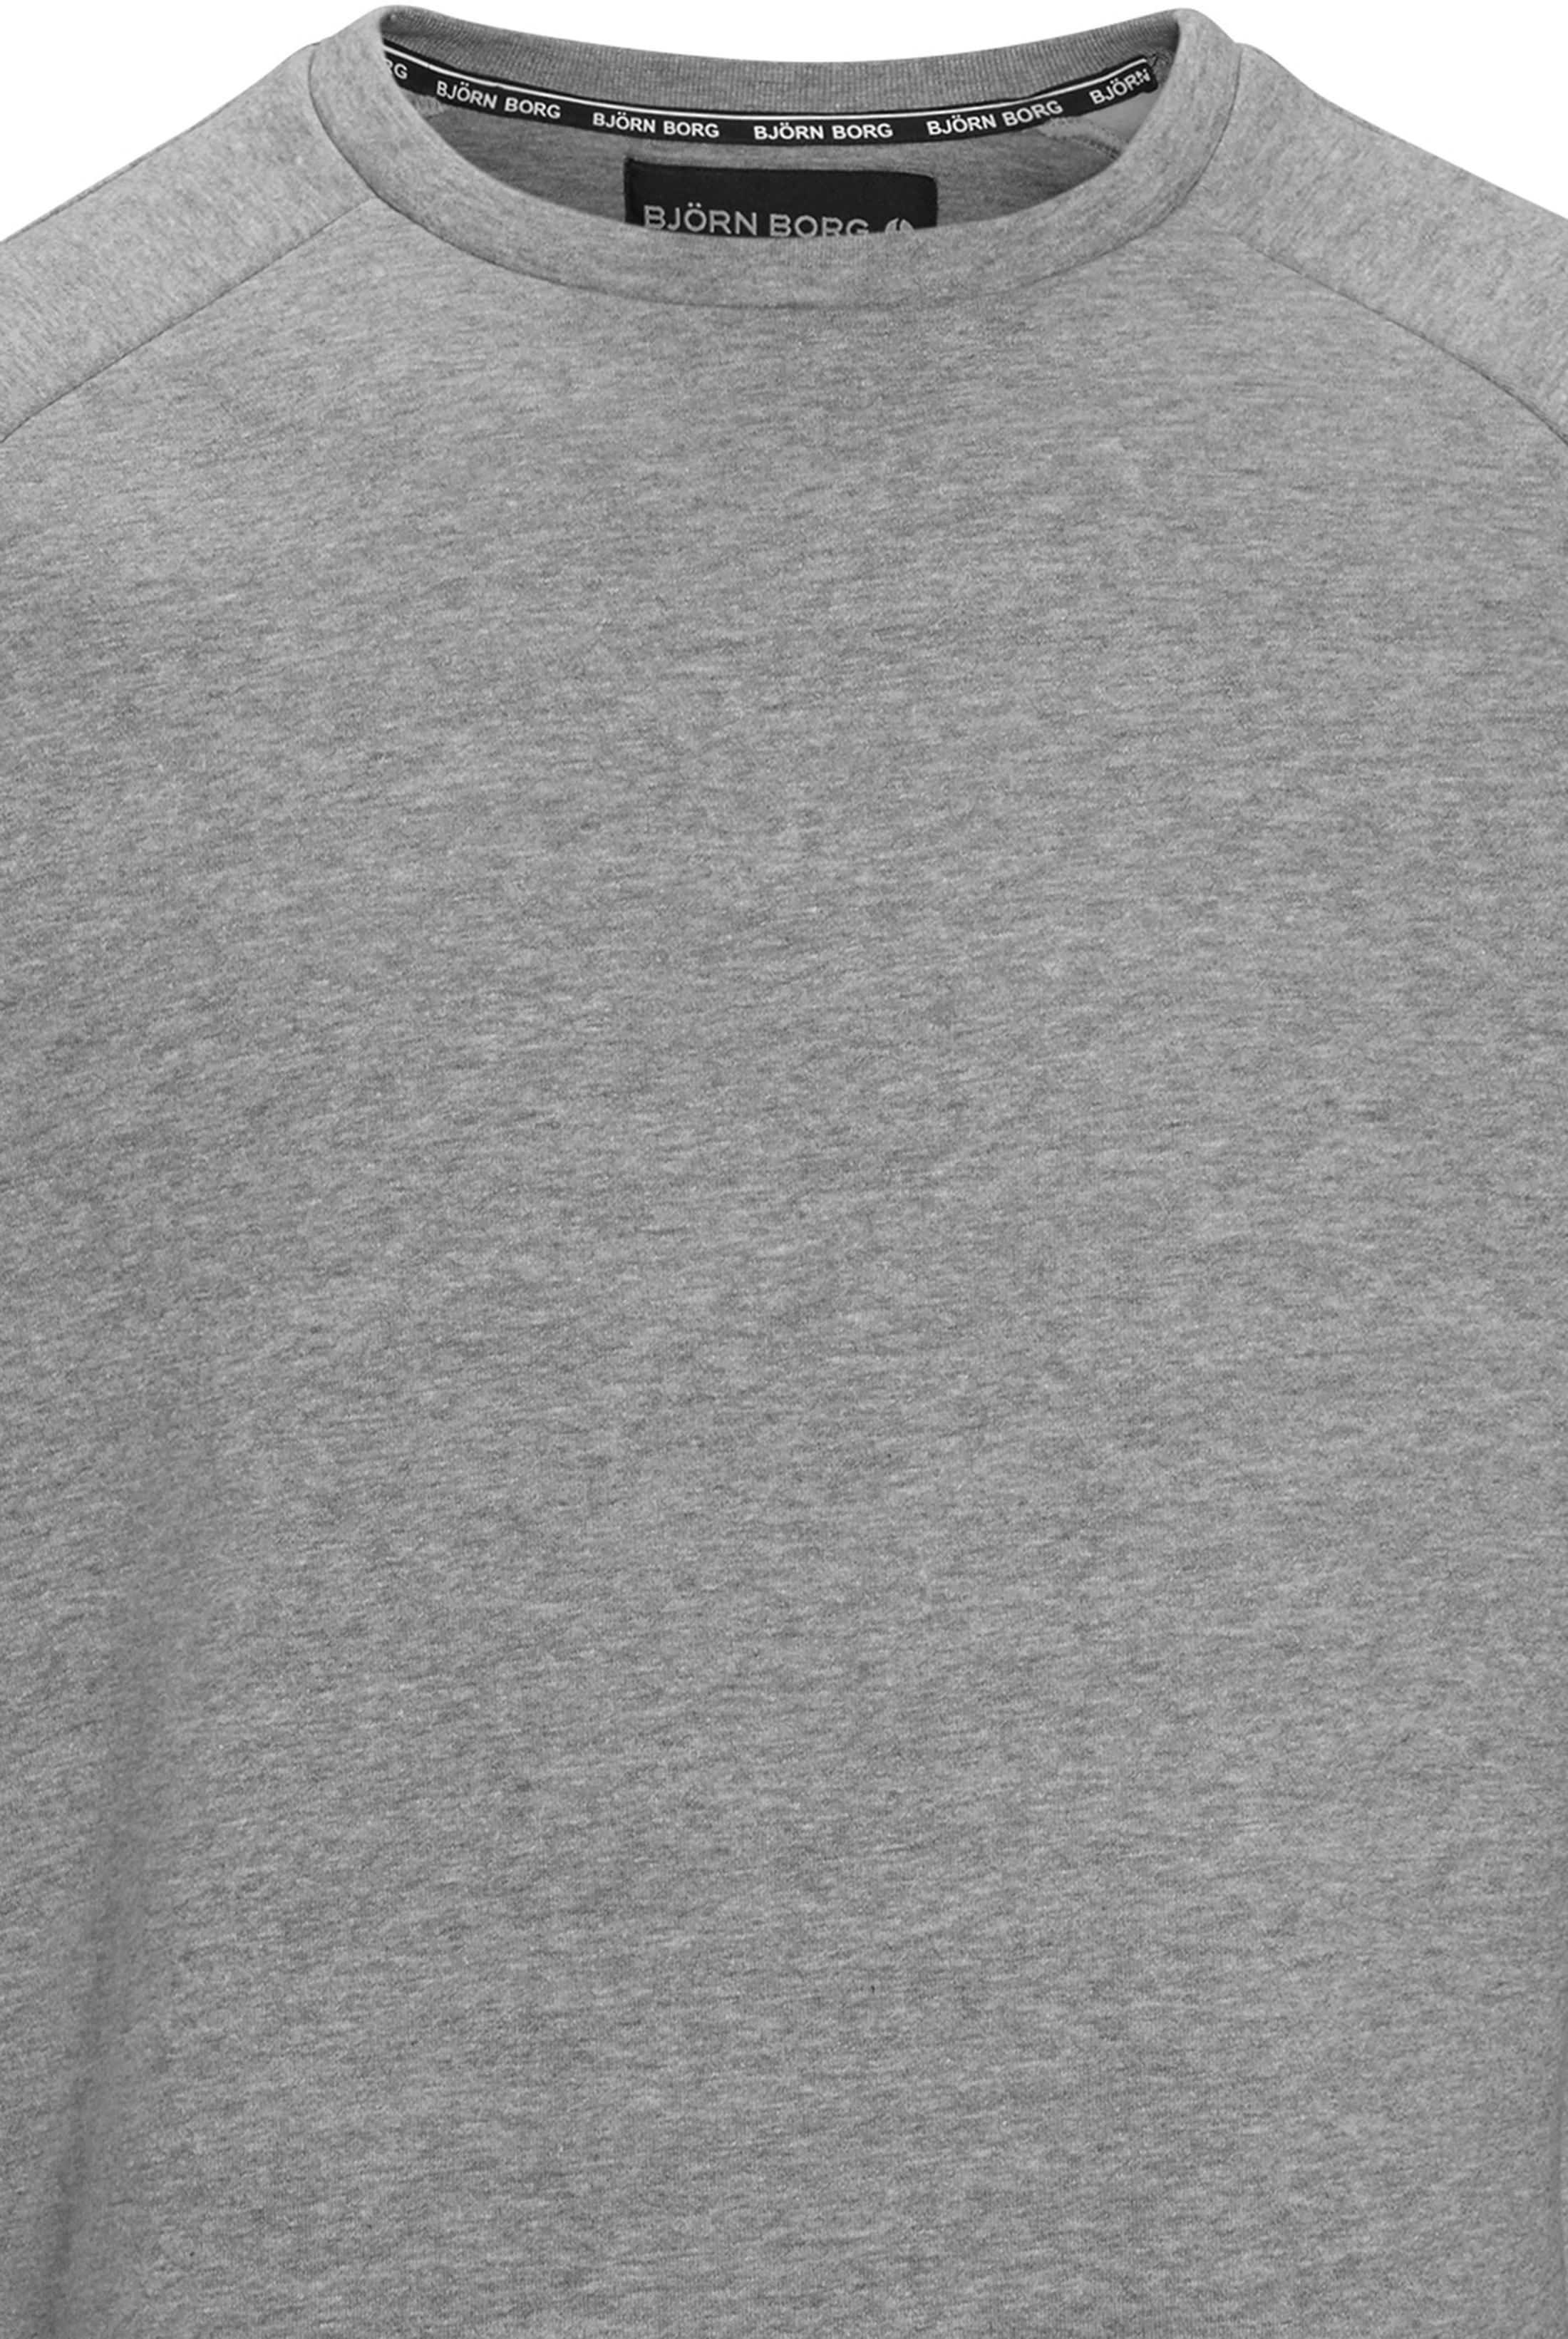 Bjorn Borg Sweater Melange Grey foto 1